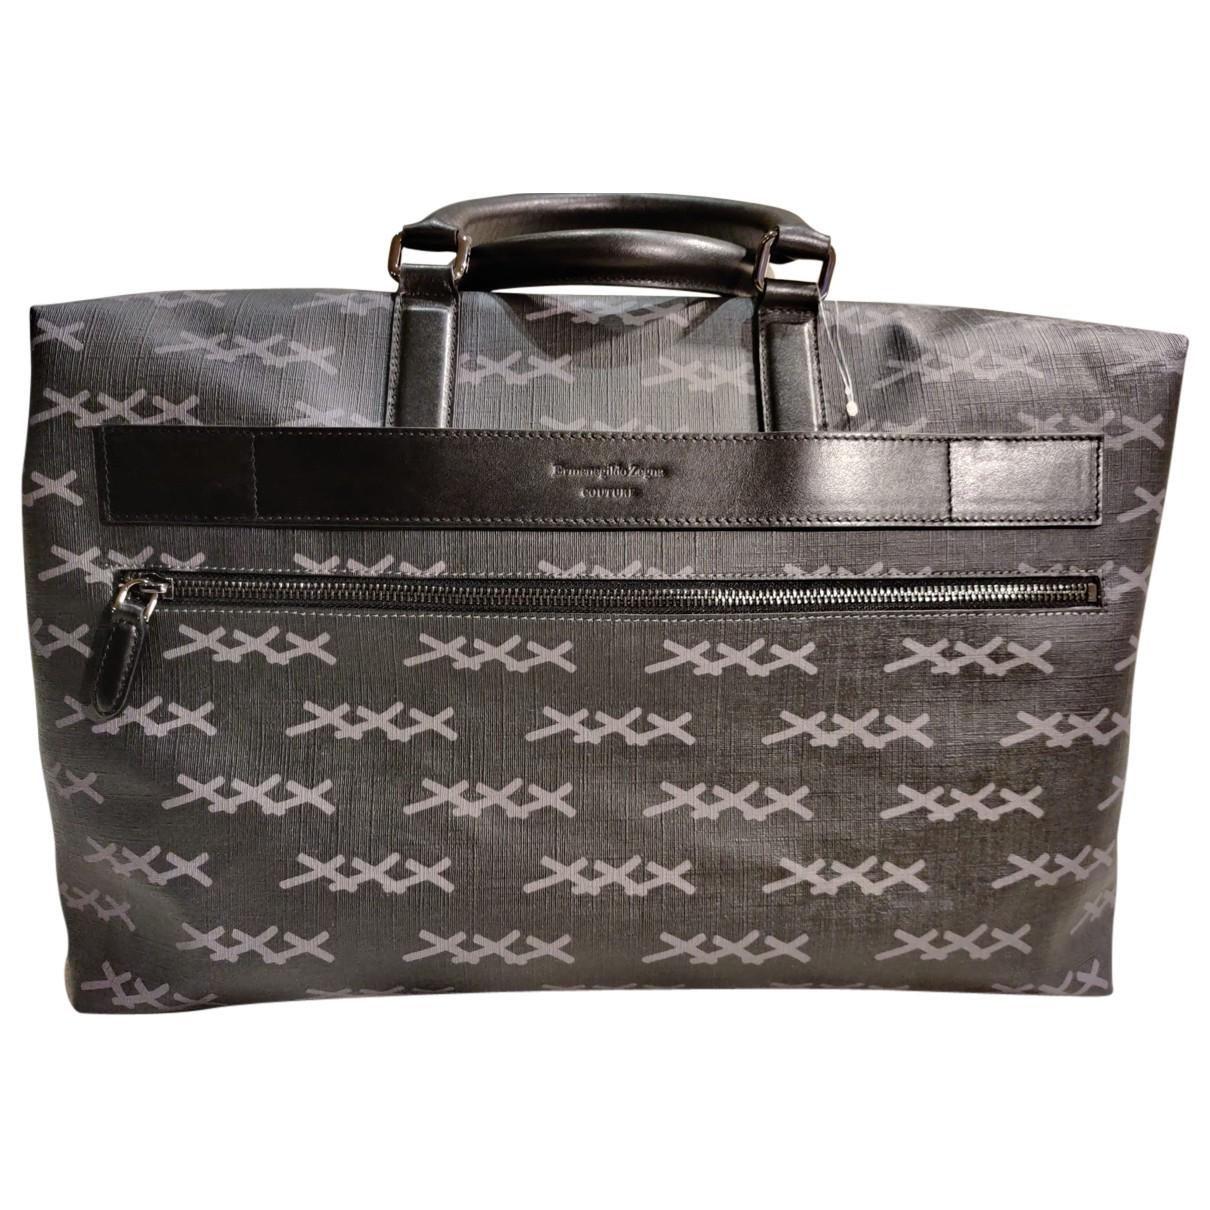 Ermenegildo Zegna N Grey Leather bag for Men N